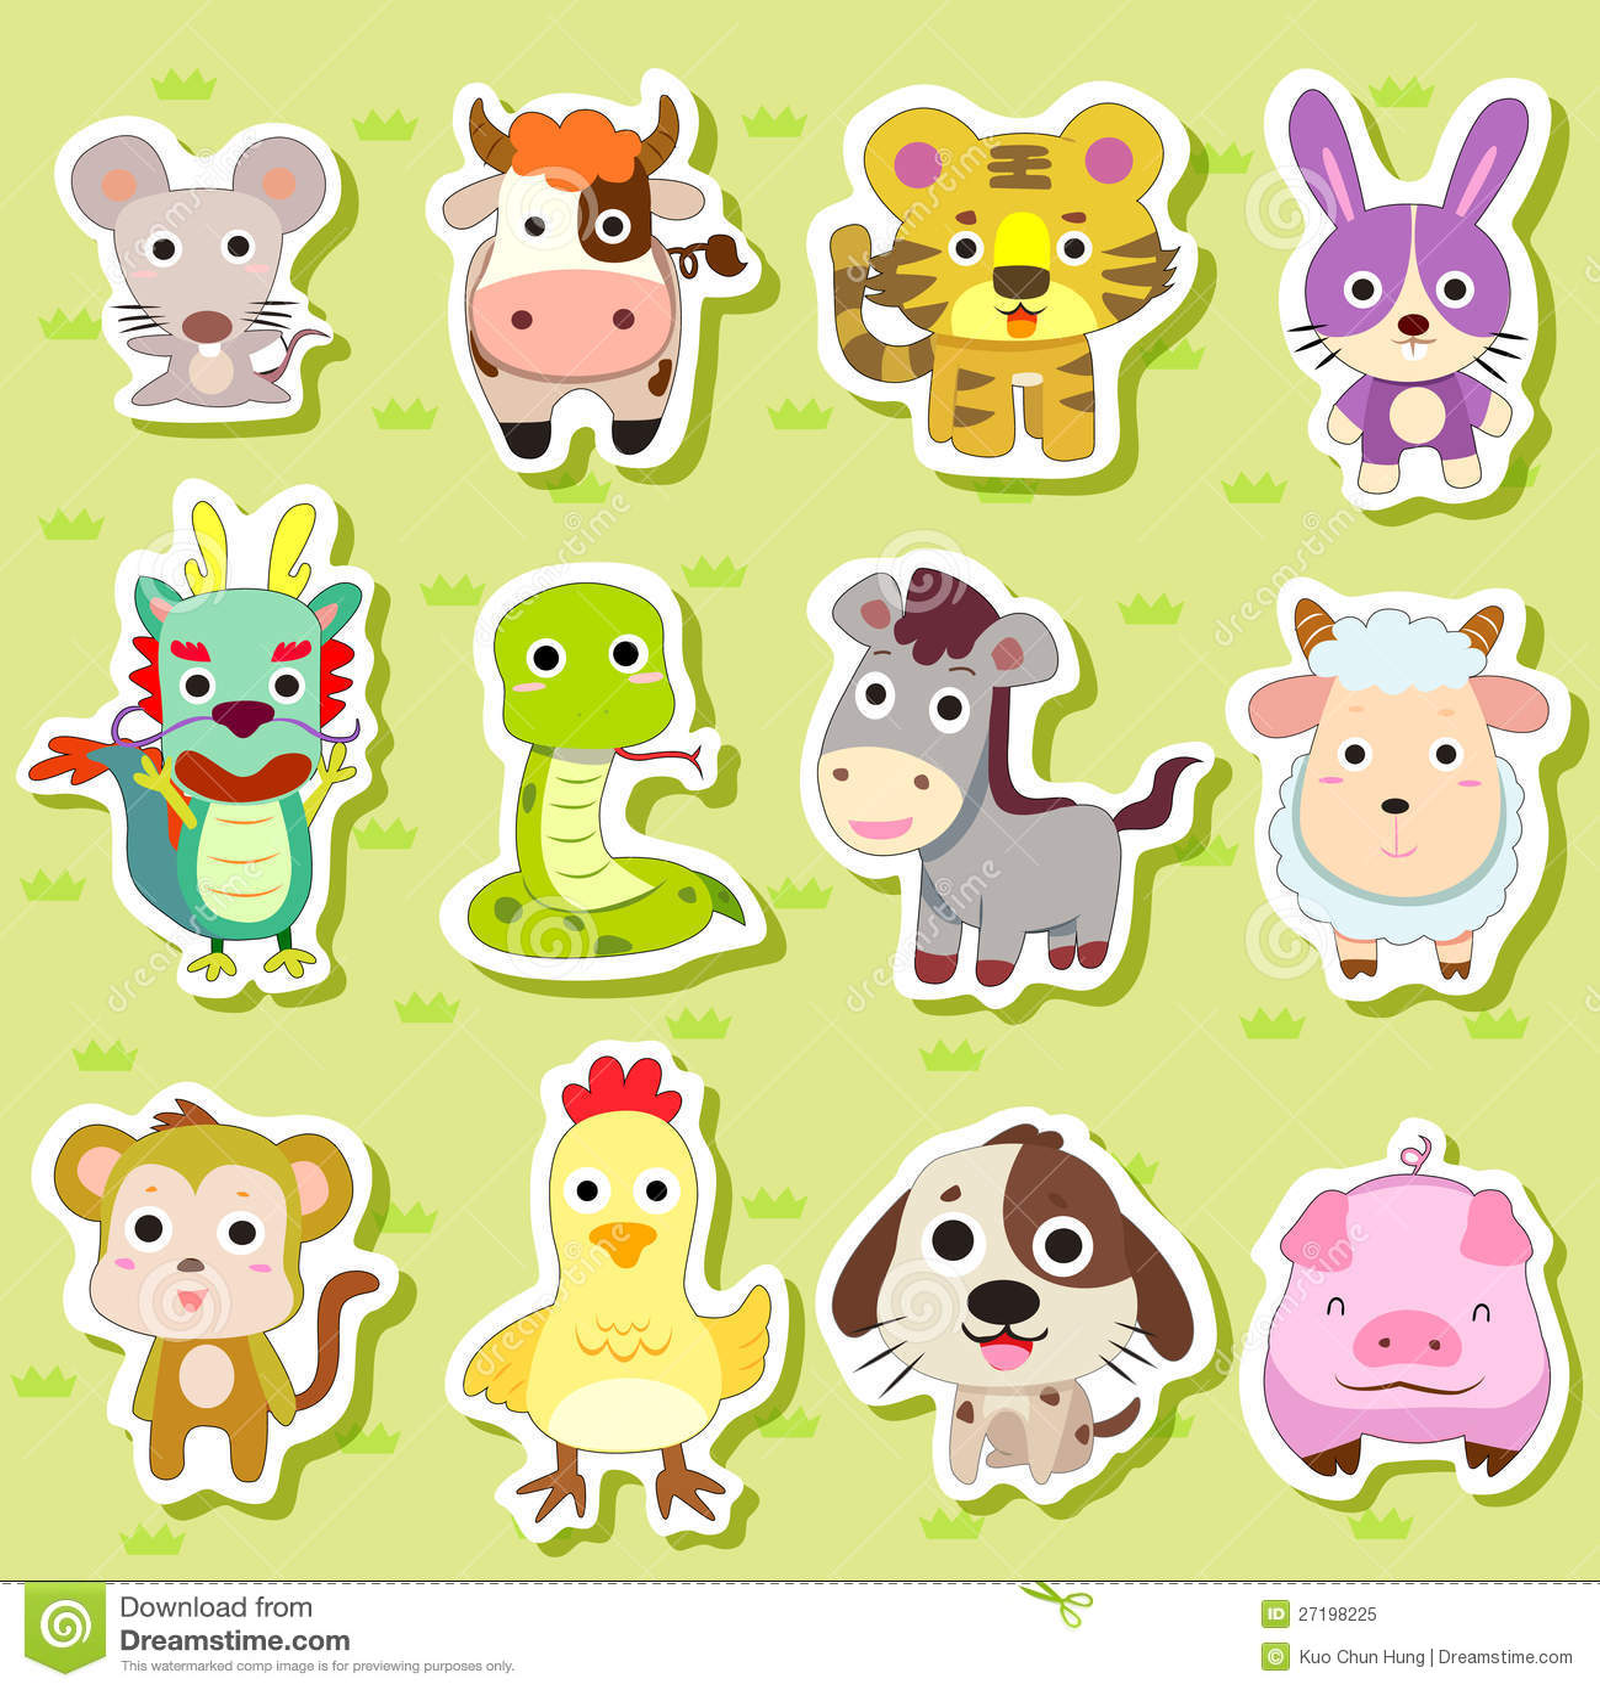 12 Chinese Zodiac animal stickers,cartoon vector illustration.